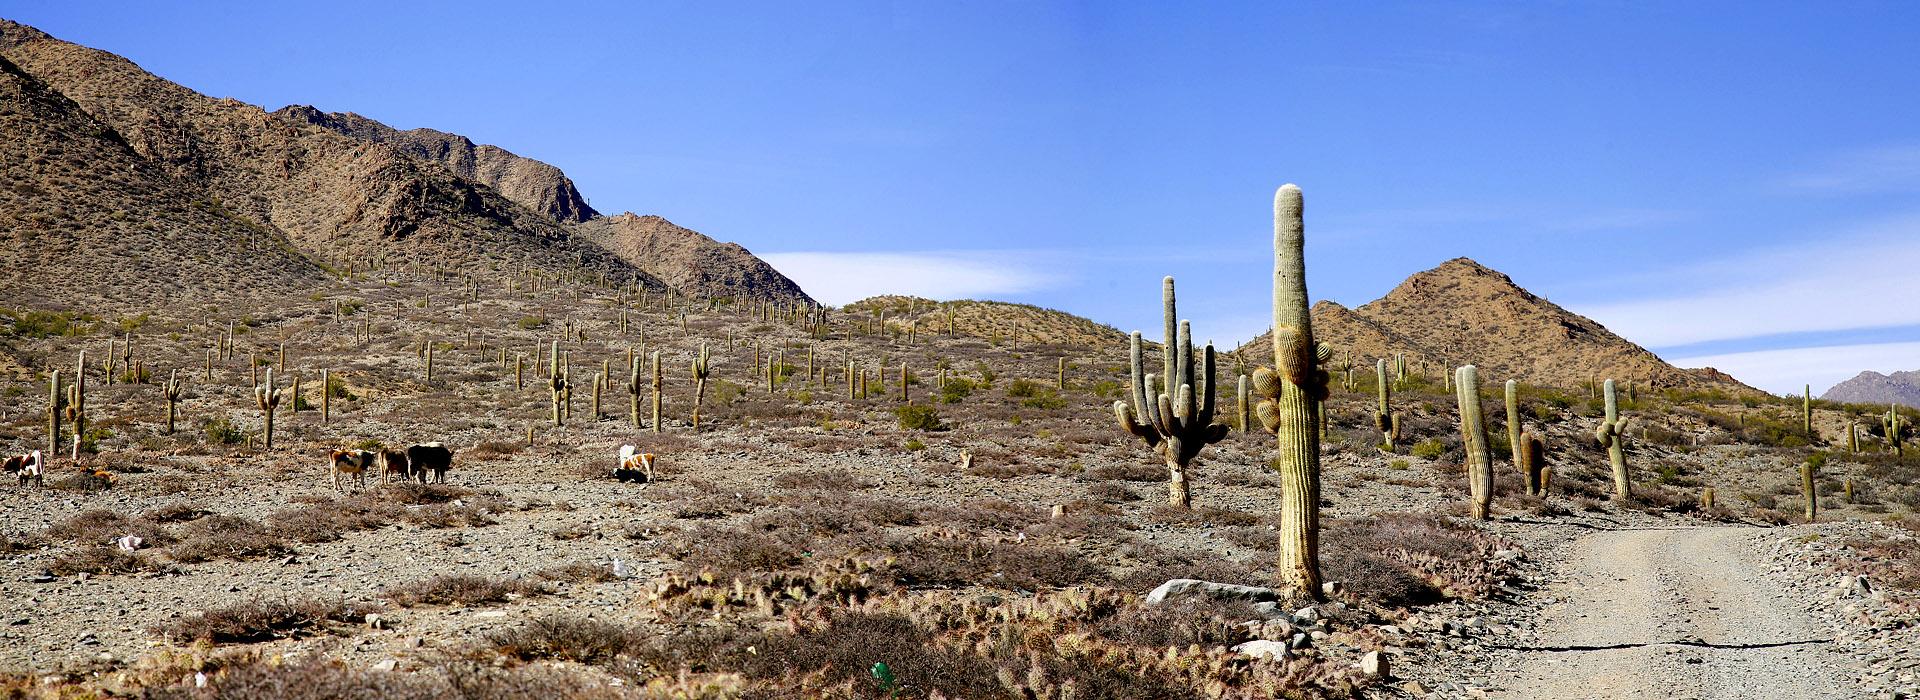 Motorreizen Zuid-Amerika door Chili, Argentine, Peru en Bolivia, expeditie Uturuncu van Travel 2 Explore motorreizen